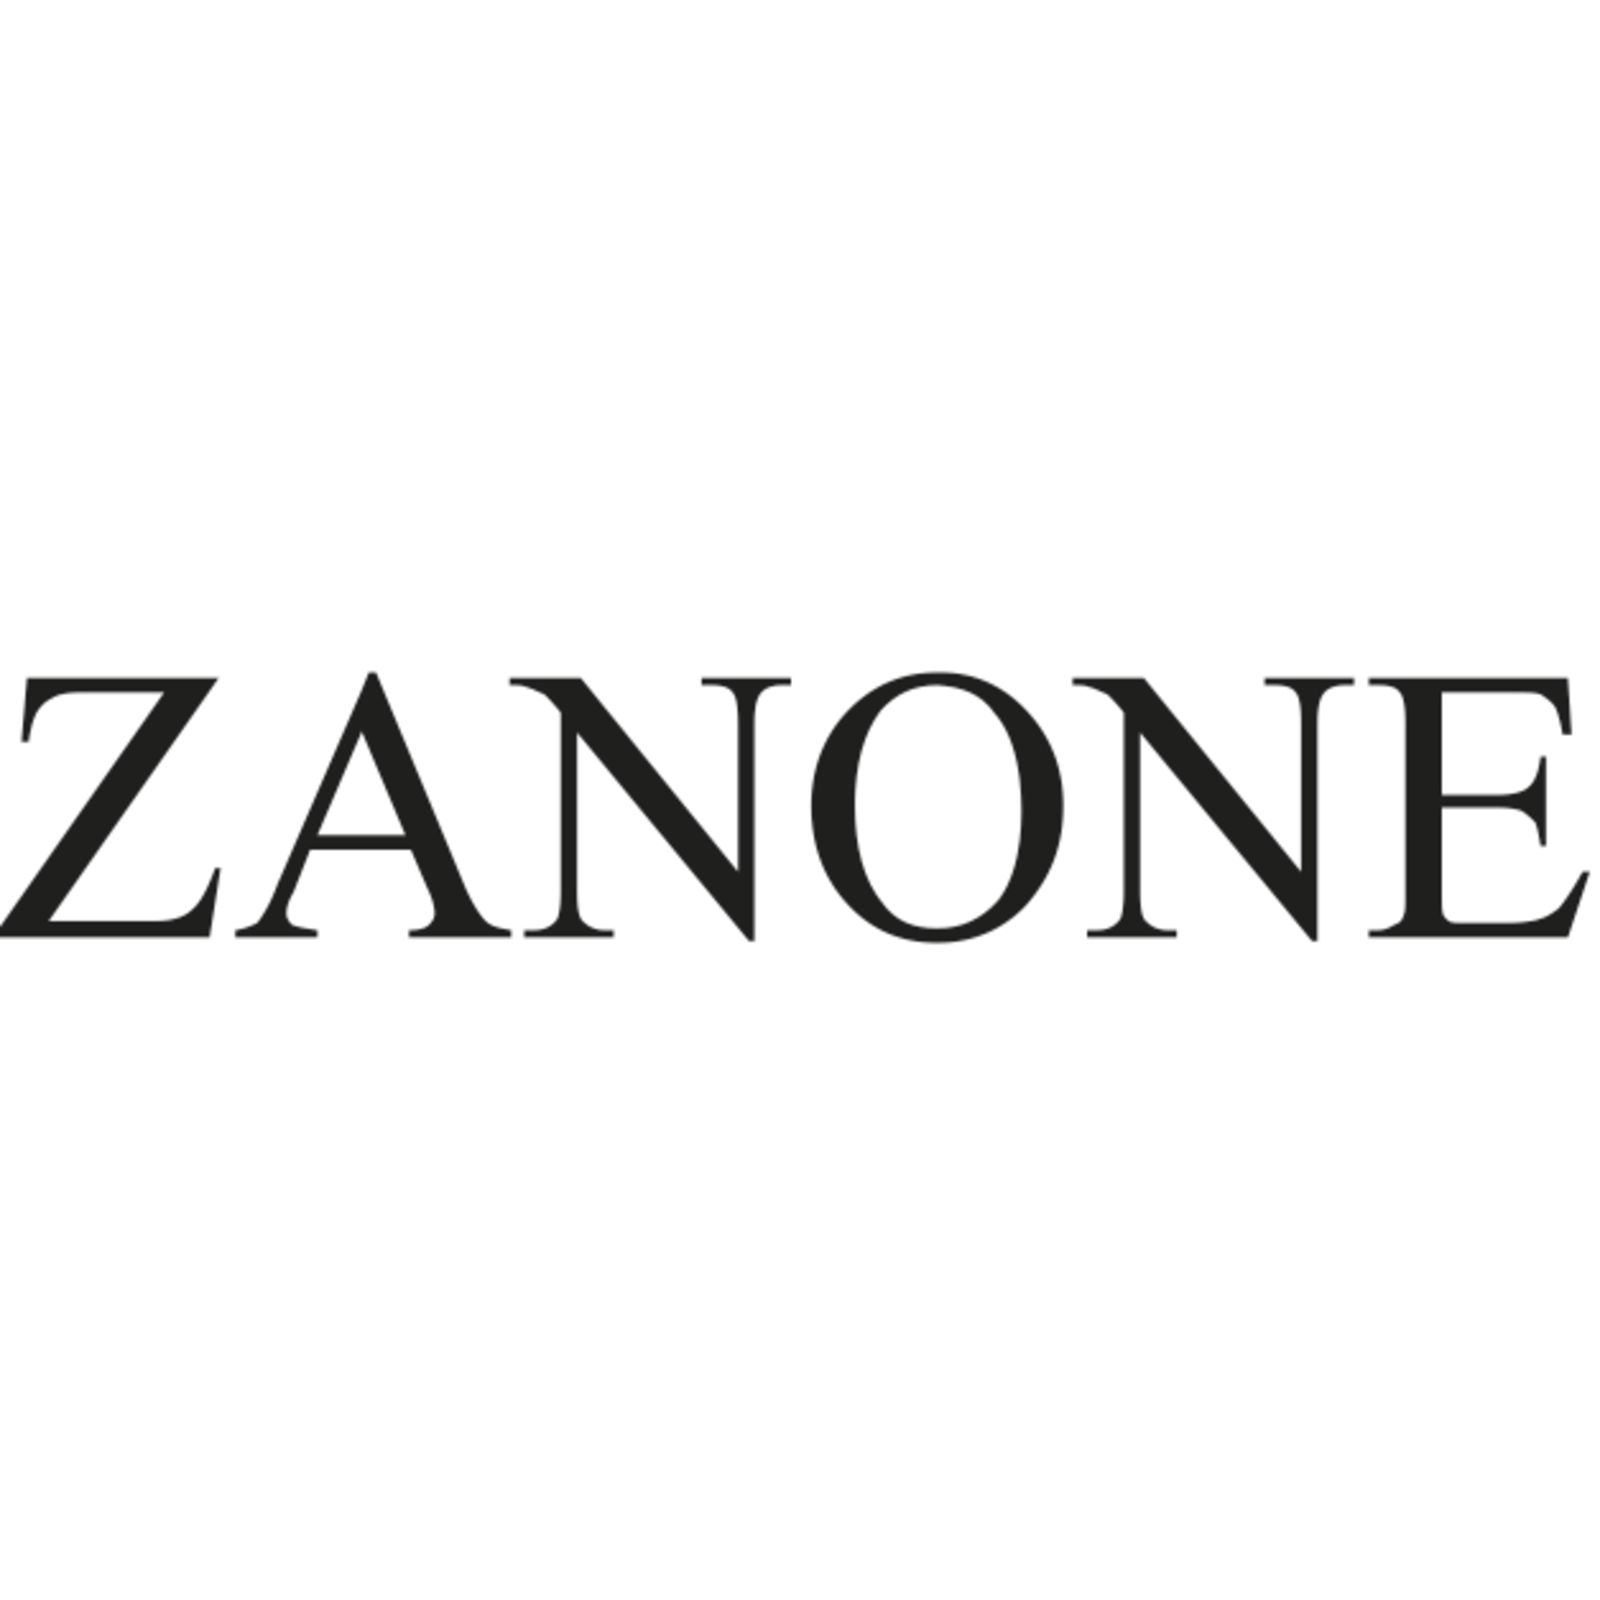 ZANONE (Bild 1)